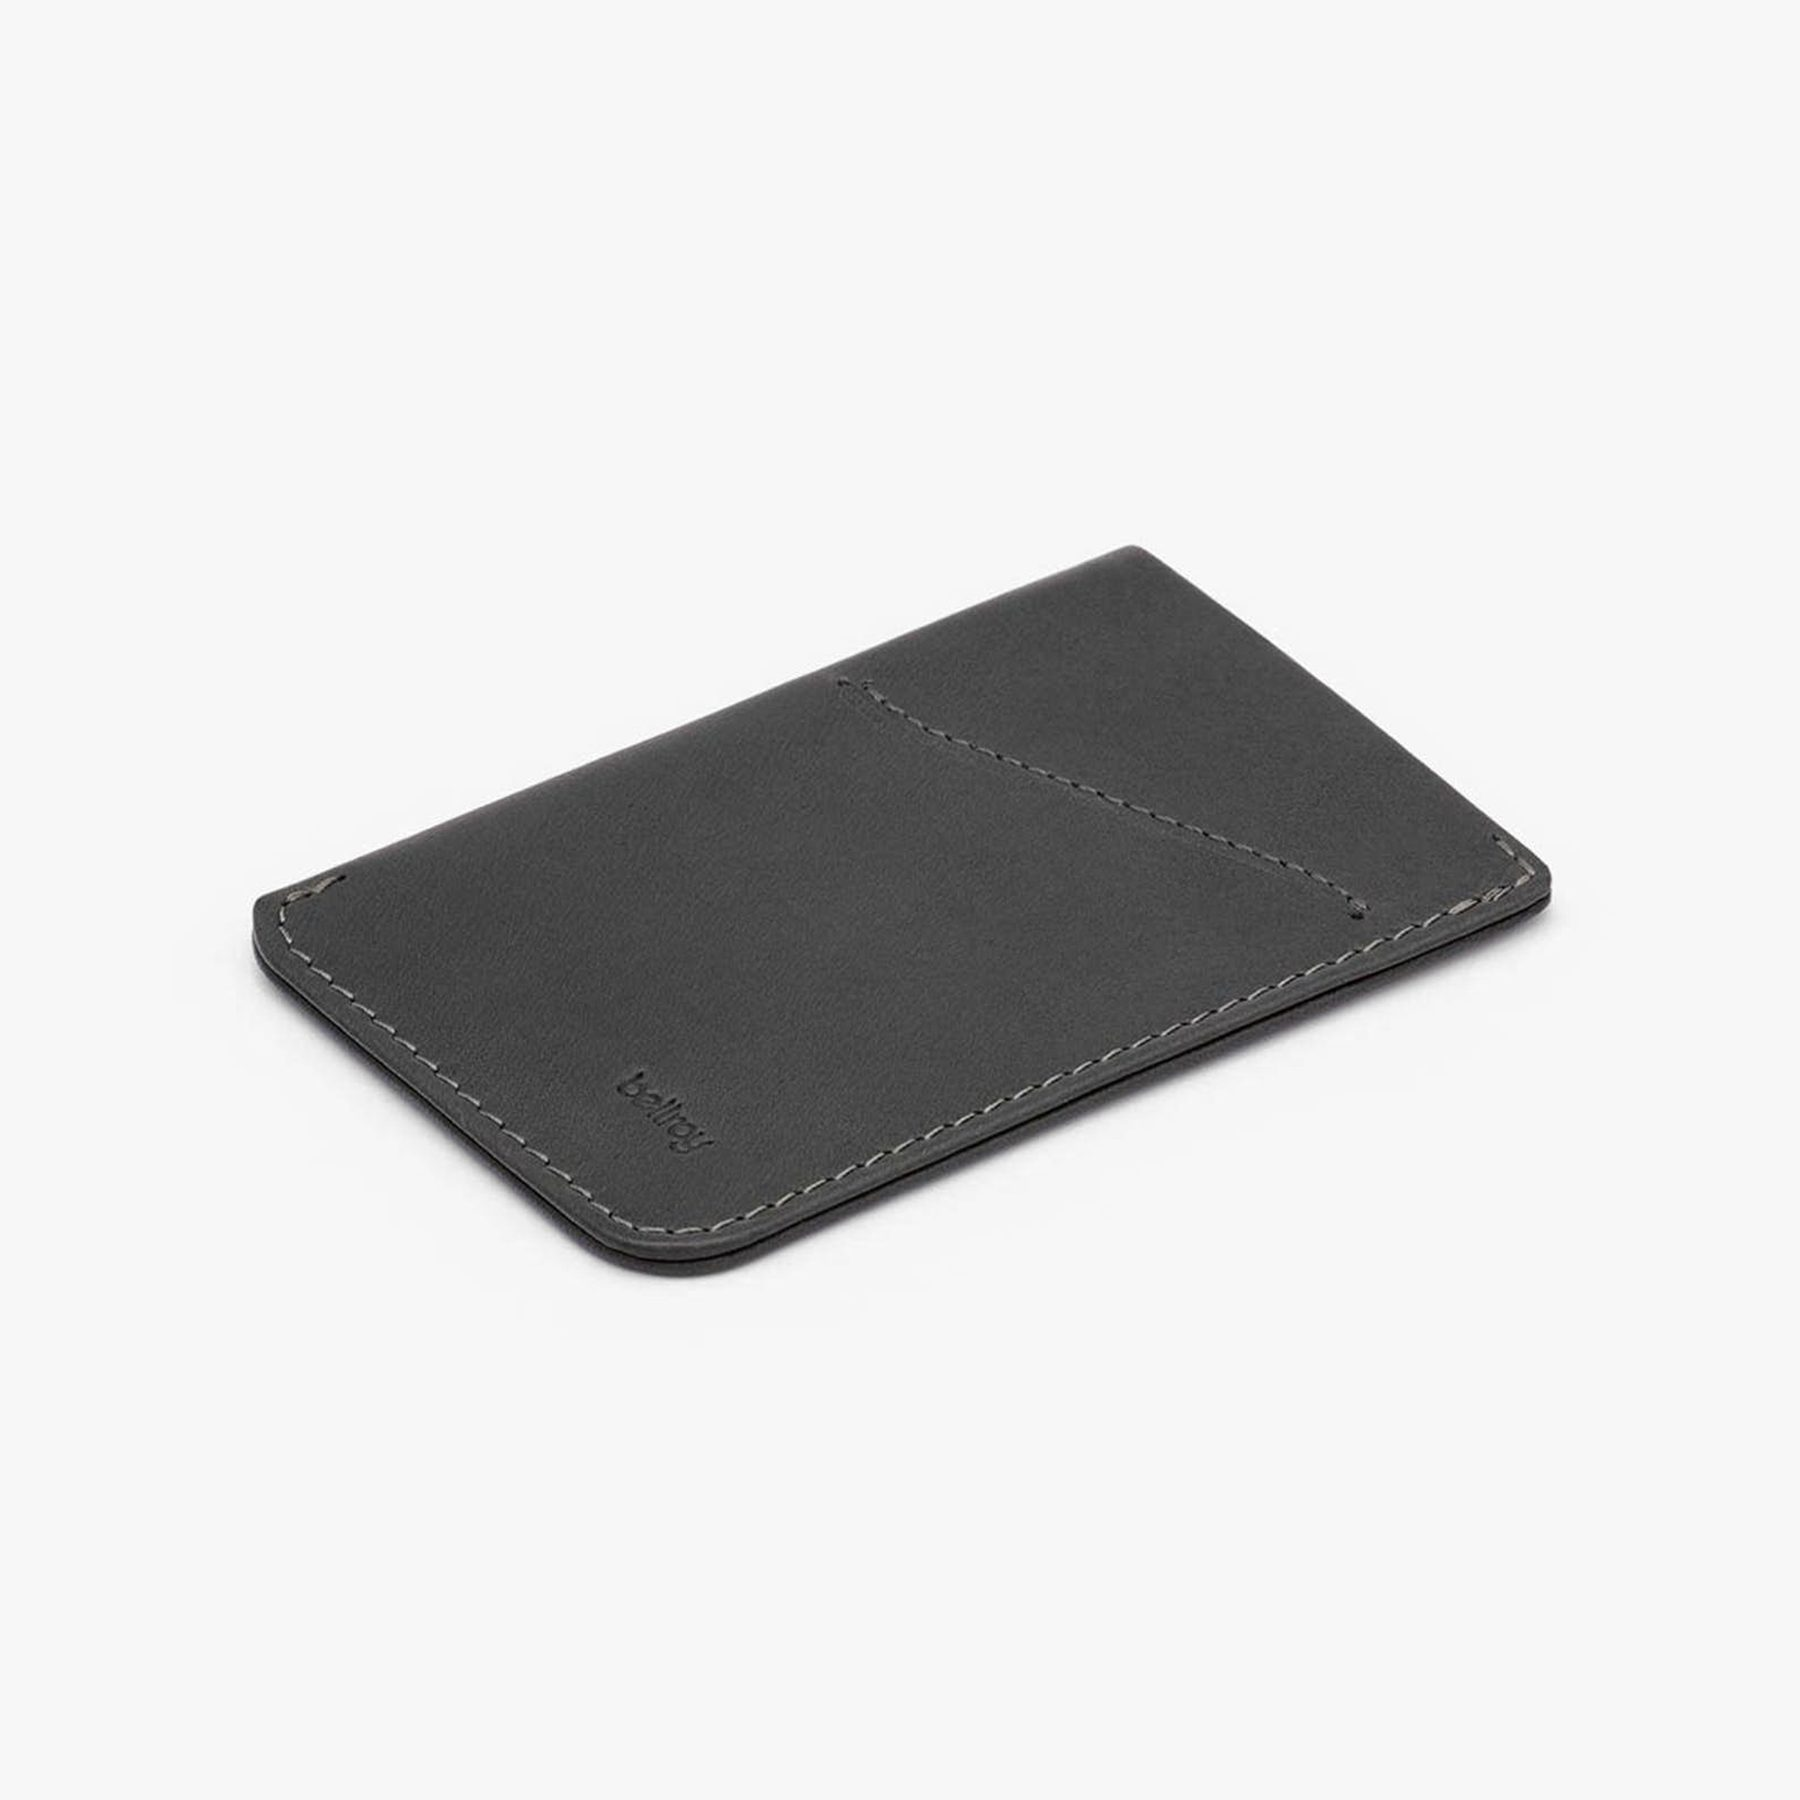 Bellroy Card Sleeve Wallet